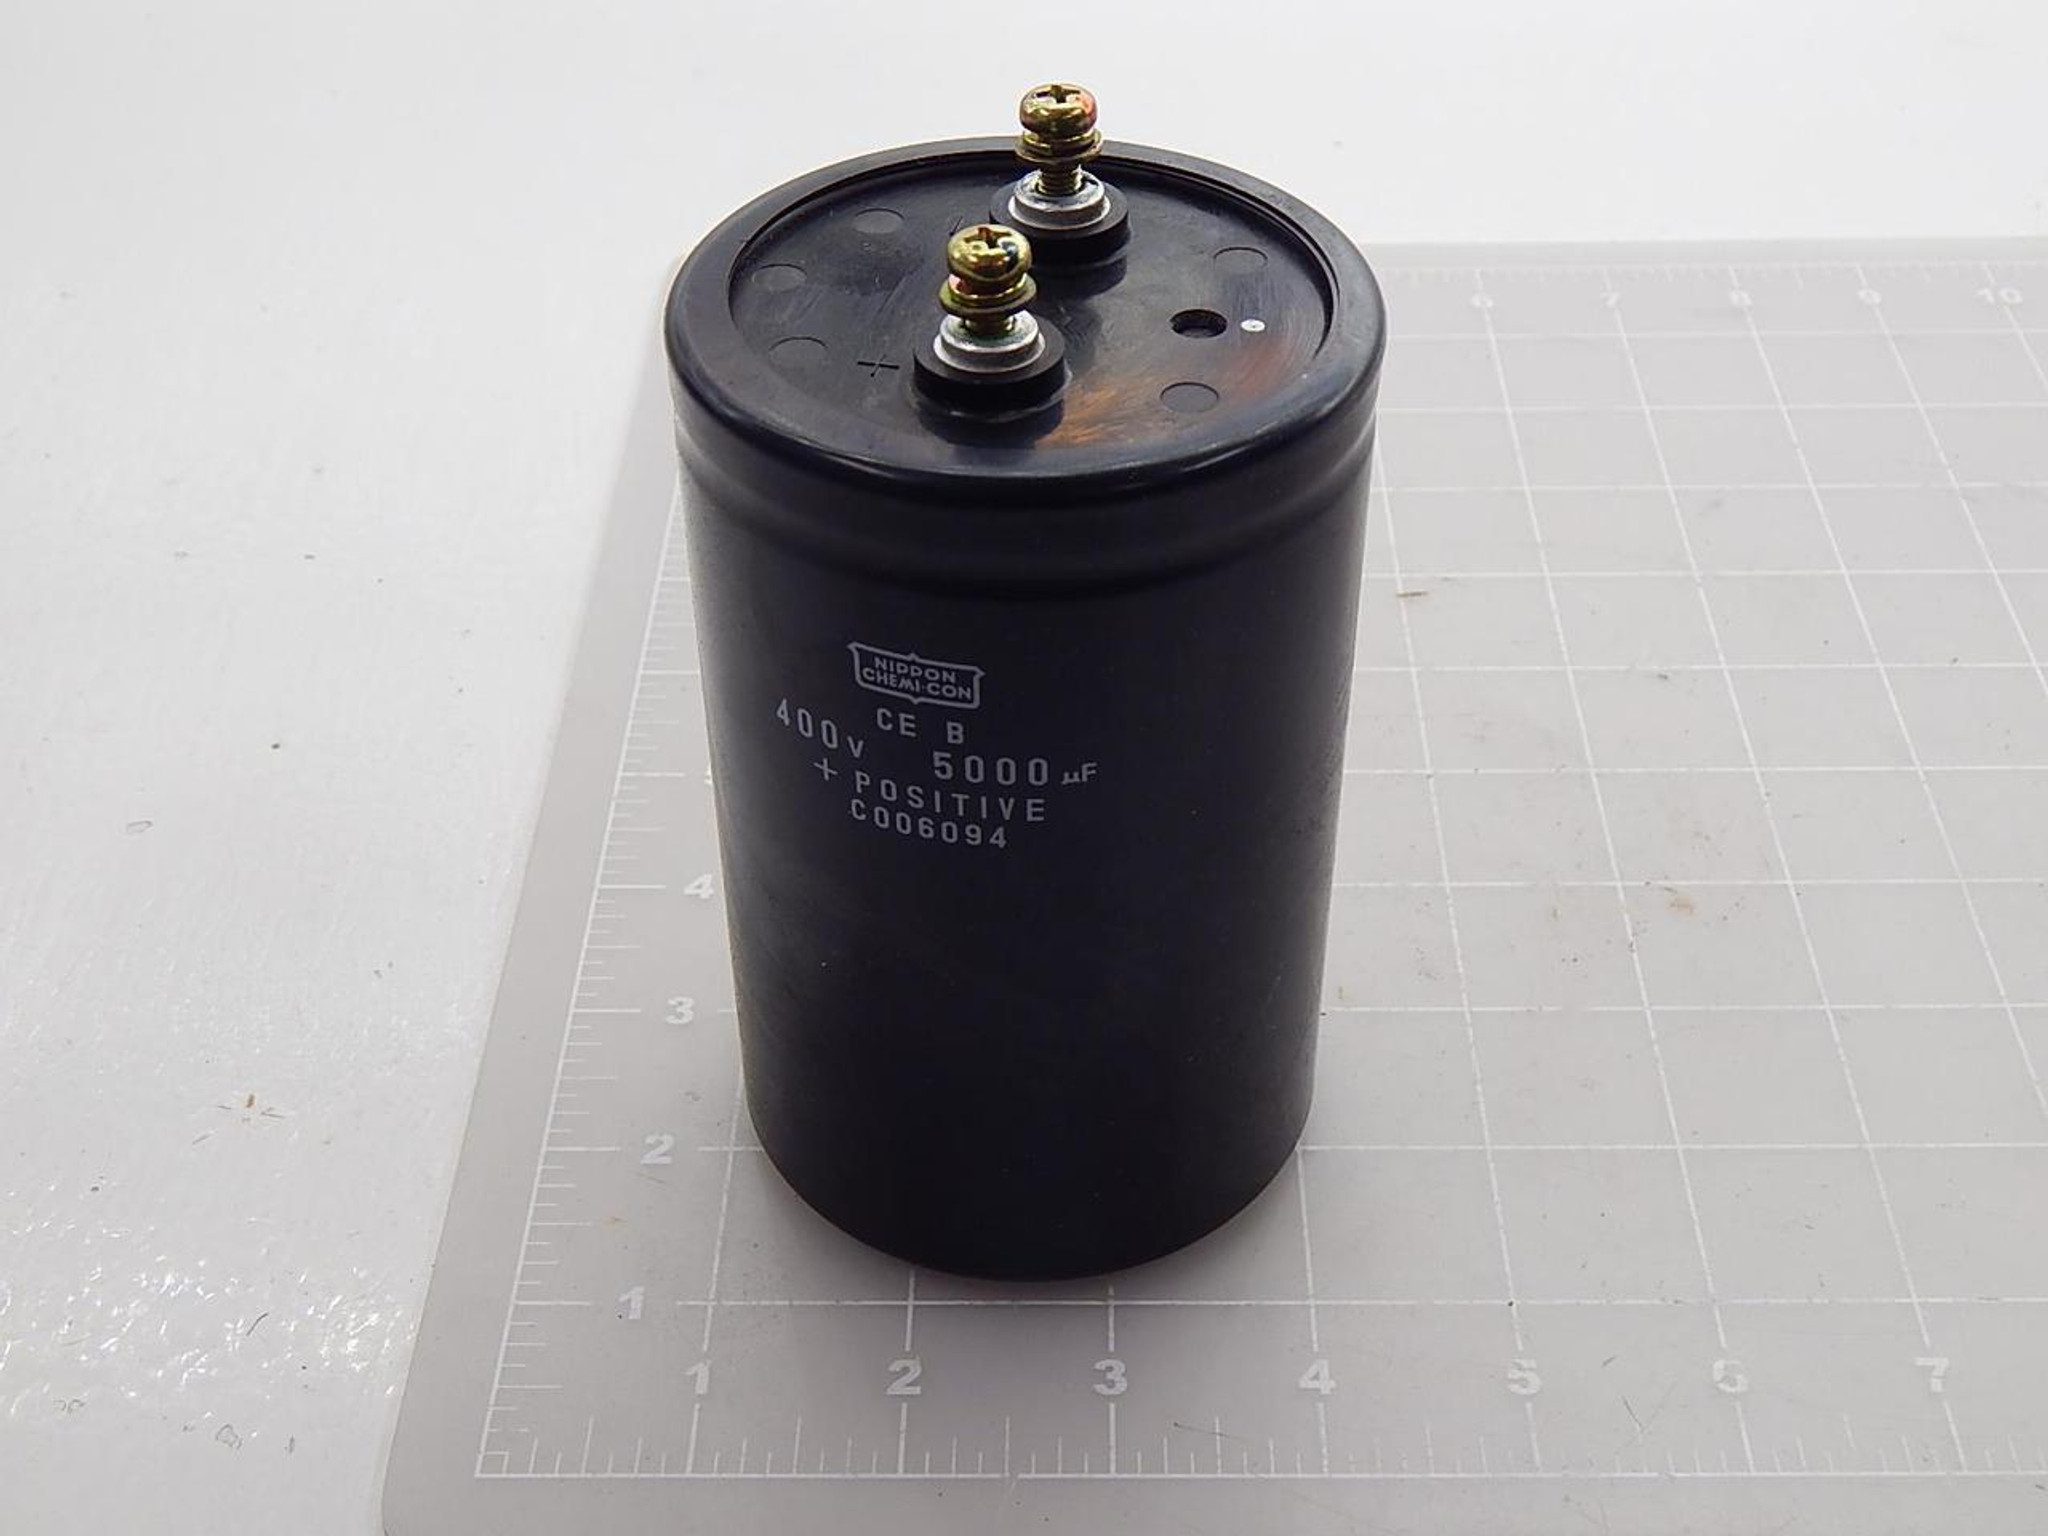 Nippon Chemi-Con C006094 CE B Capacitor, 5000 uF, 400 V T89092